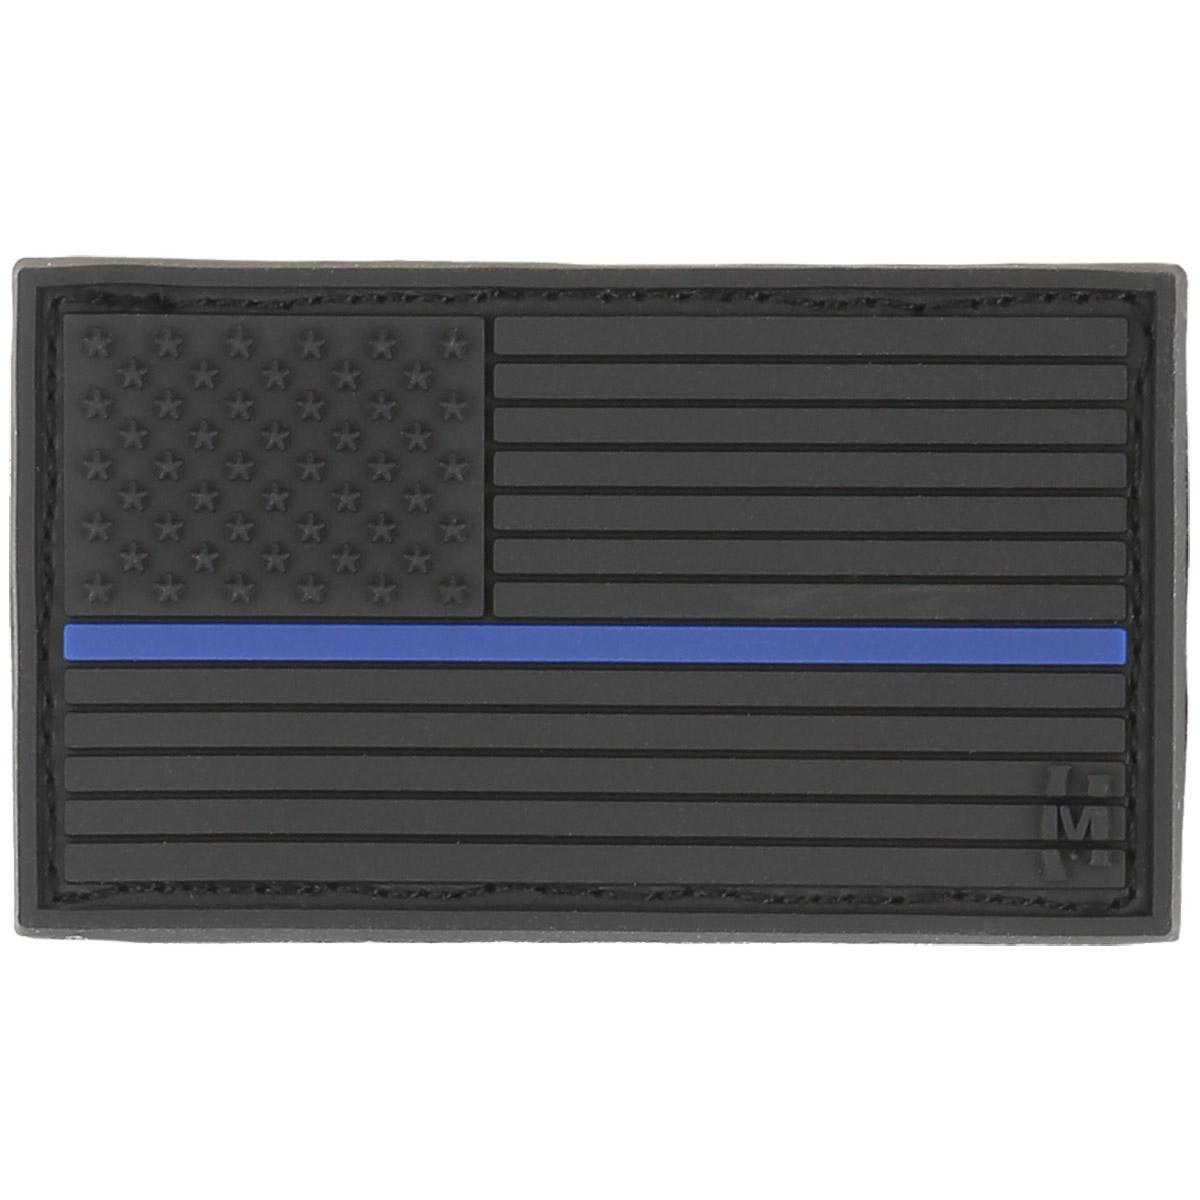 Sentinel Maxpedition Small Usa Flag Patch Pvc Emblem Badge Law Enforcemt  Thin Blue Line dbf7adfff7f